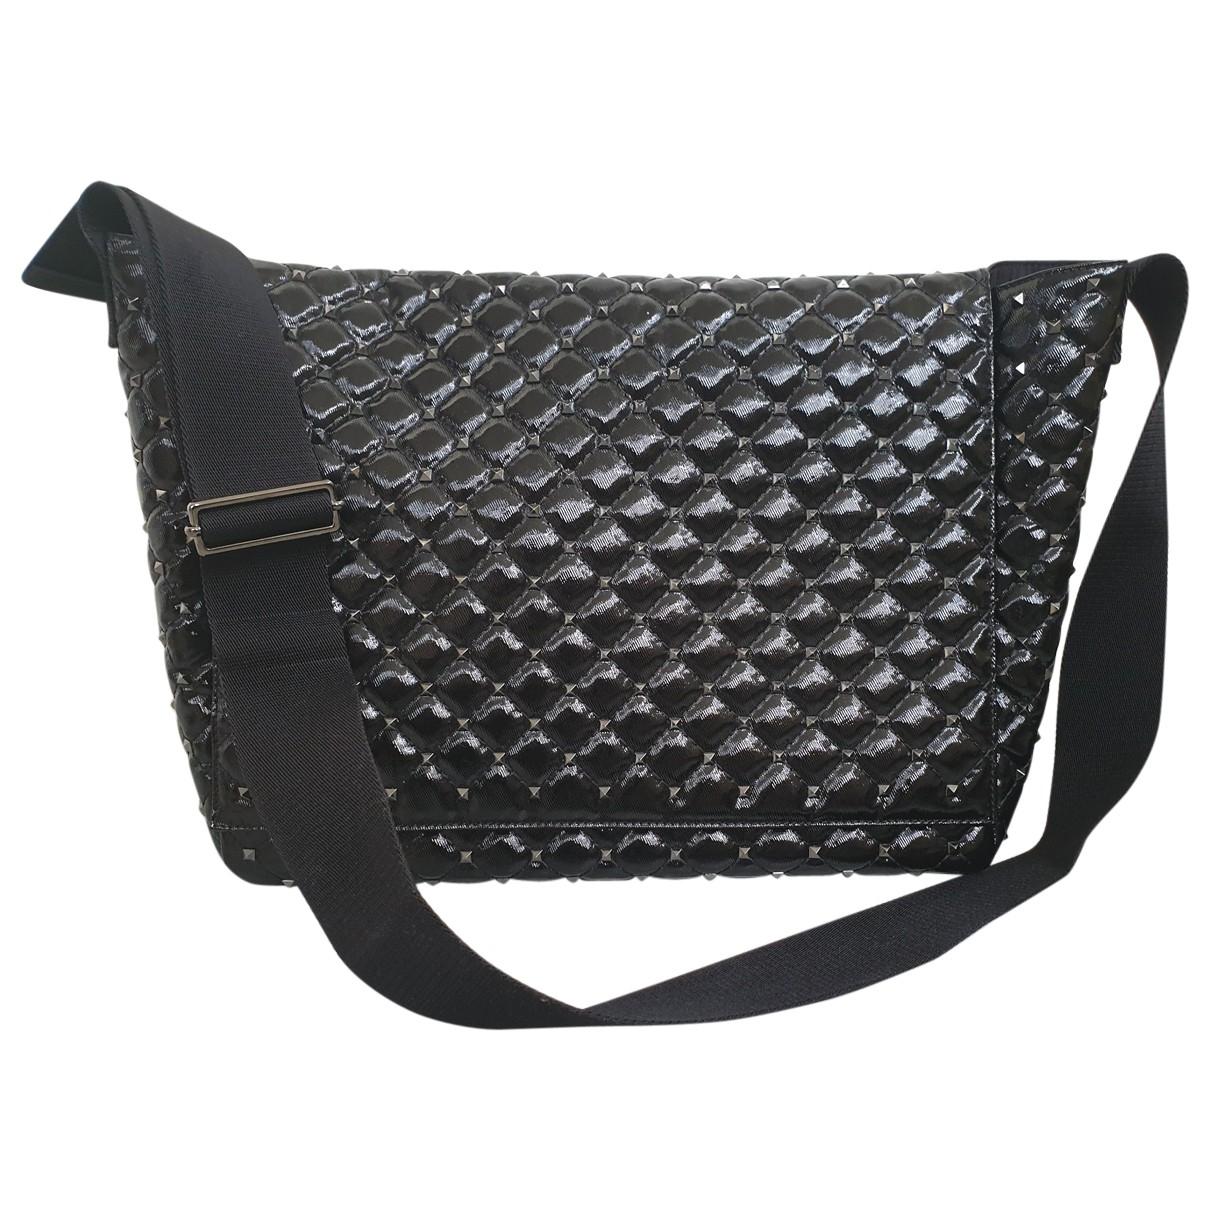 Valentino Garavani \N Black handbag for Women \N